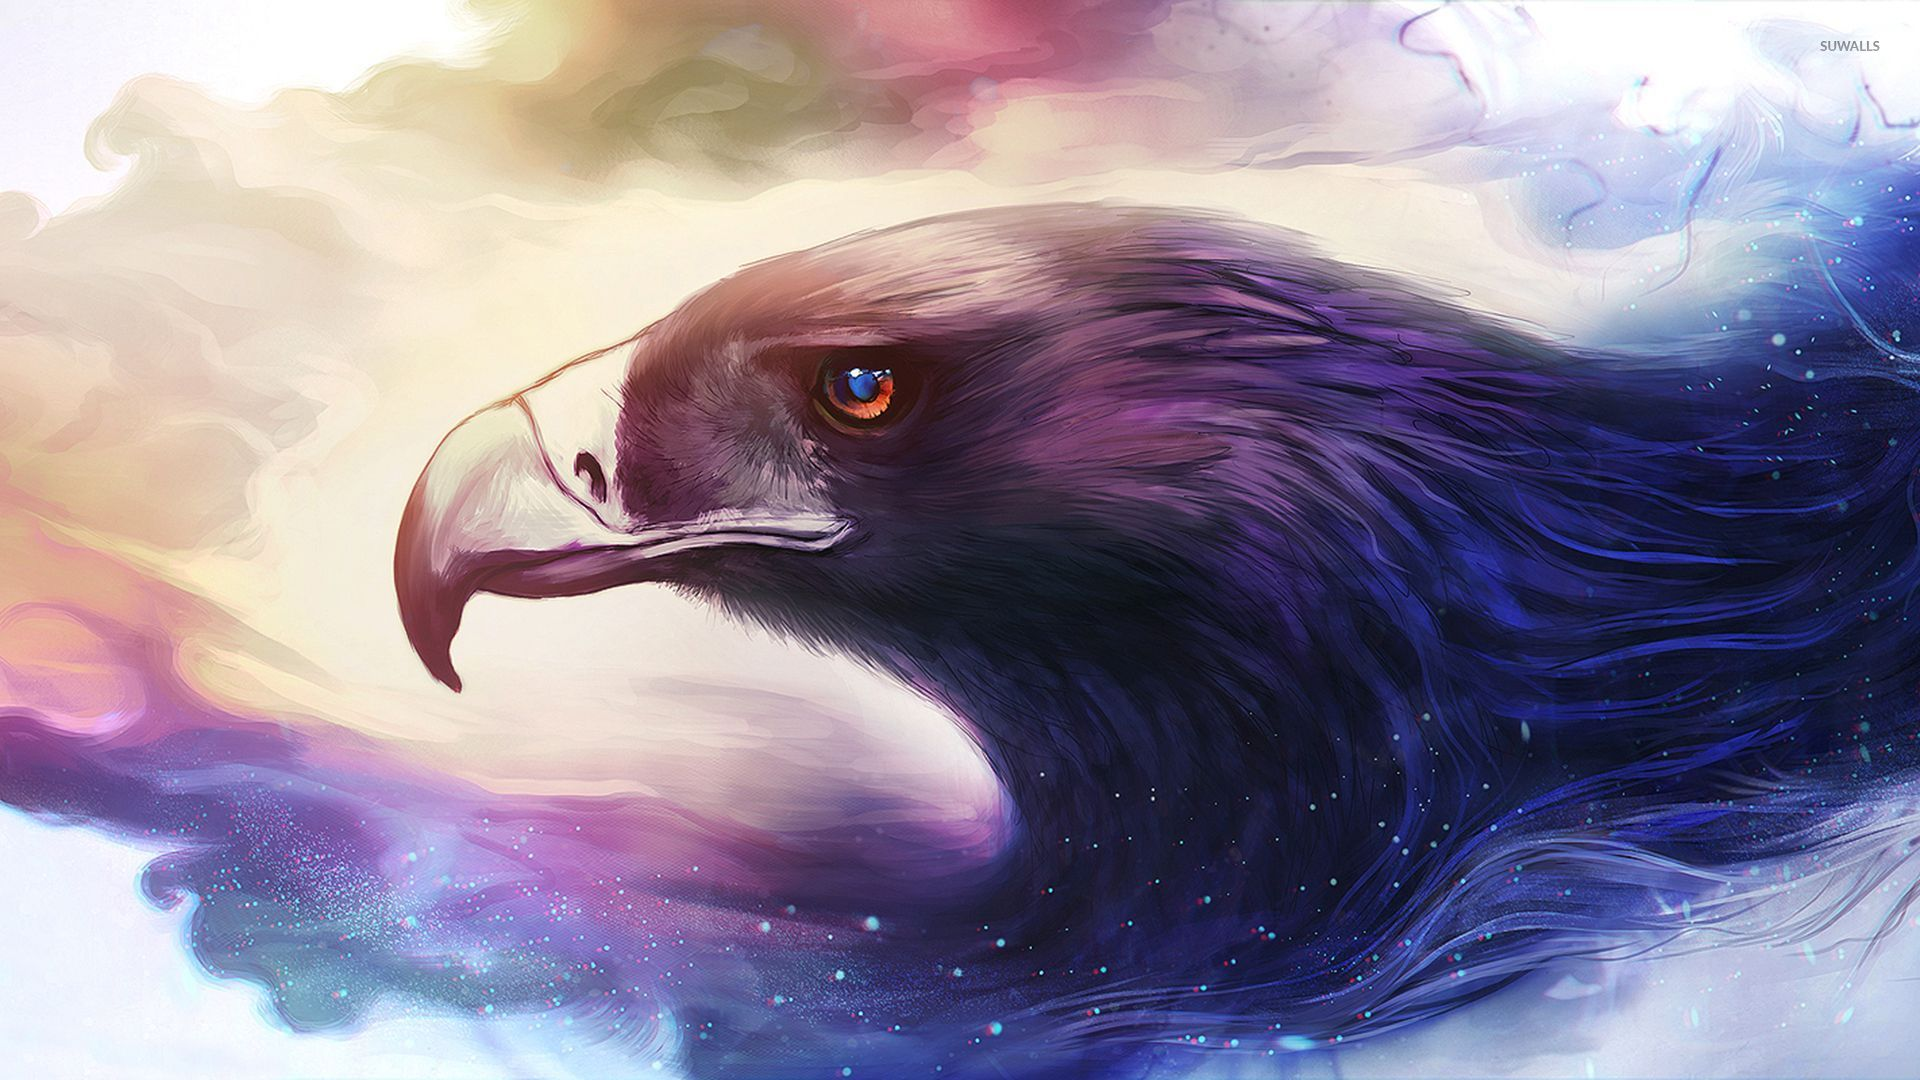 Eagle [6] wallpaper - Digital Art wallpapers - #46699